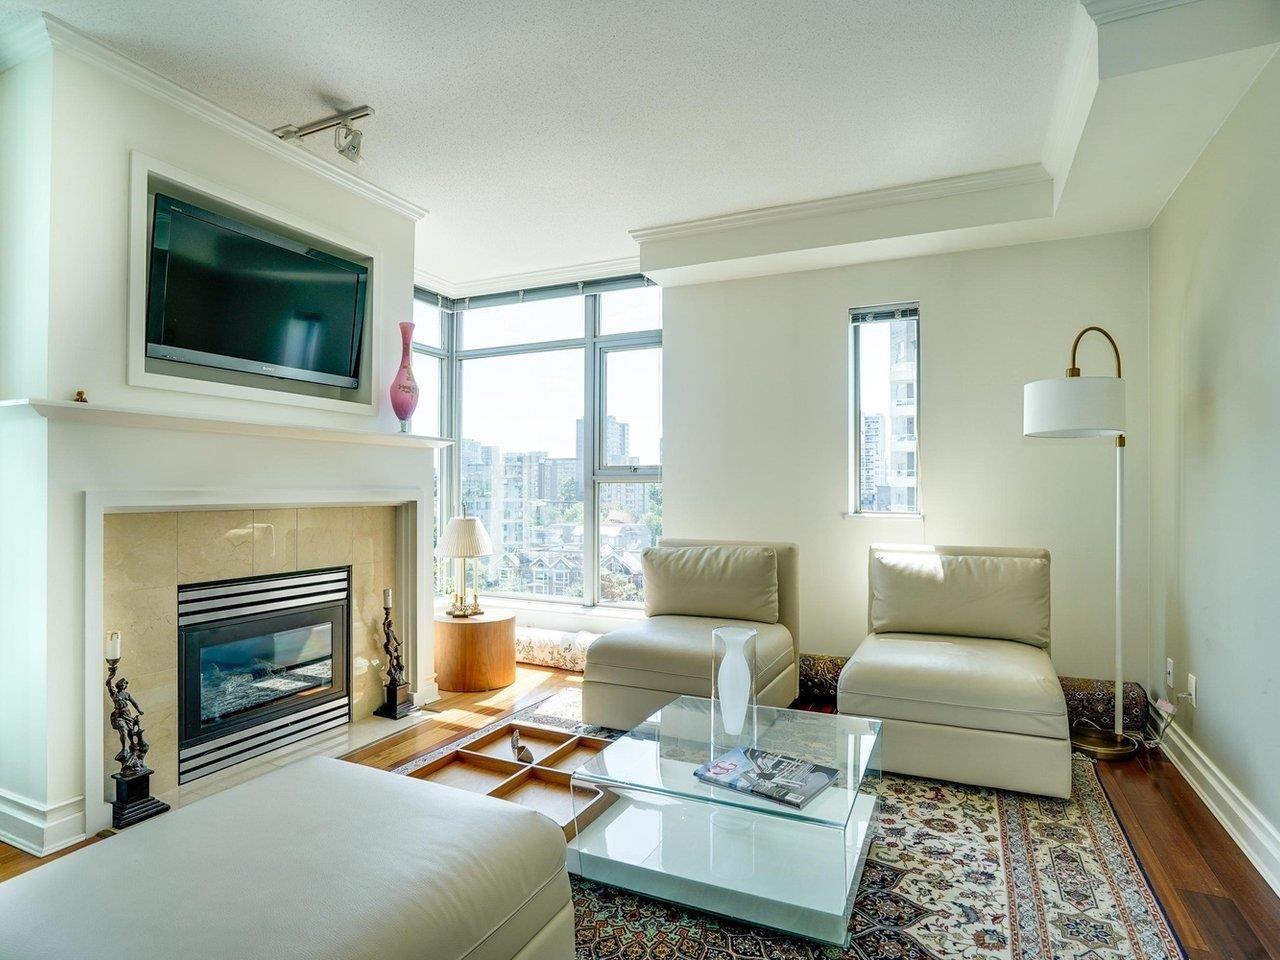 1003 1790 BAYSHORE DRIVE - Coal Harbour Apartment/Condo for sale, 1 Bedroom (R2606481) - #3